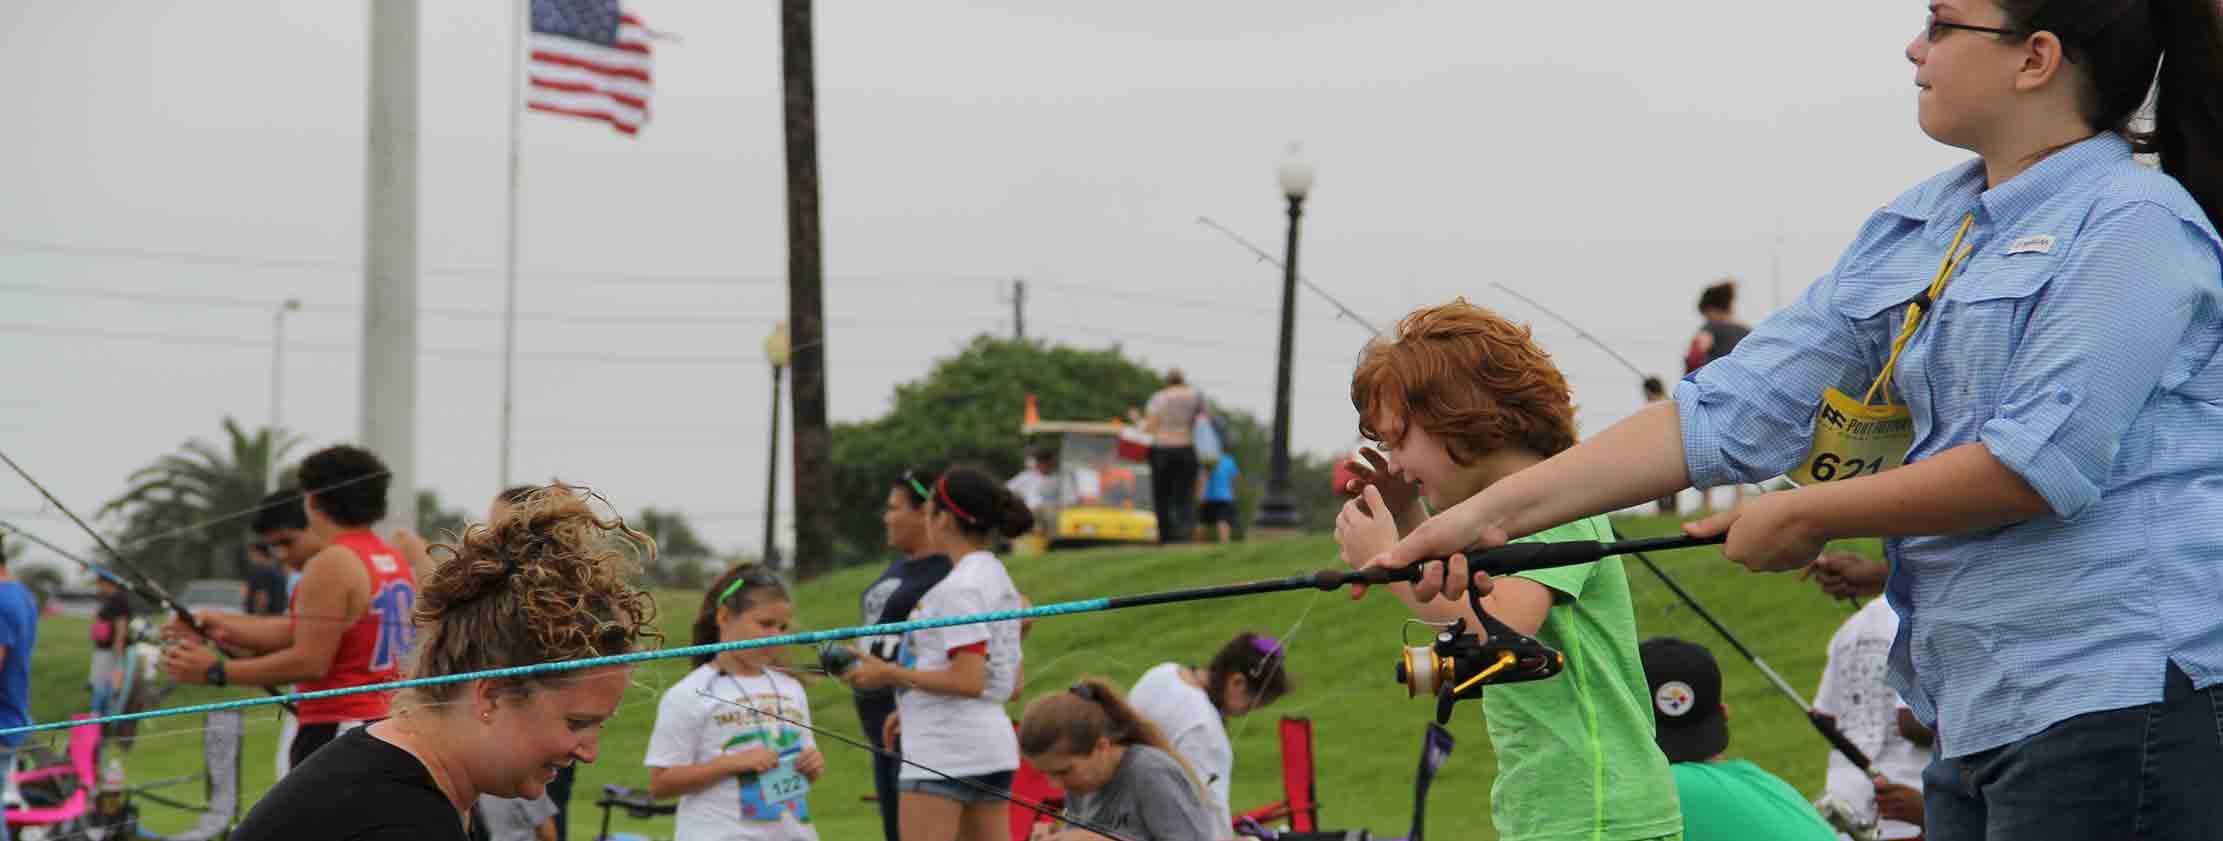 freeport tx child fishing tournament